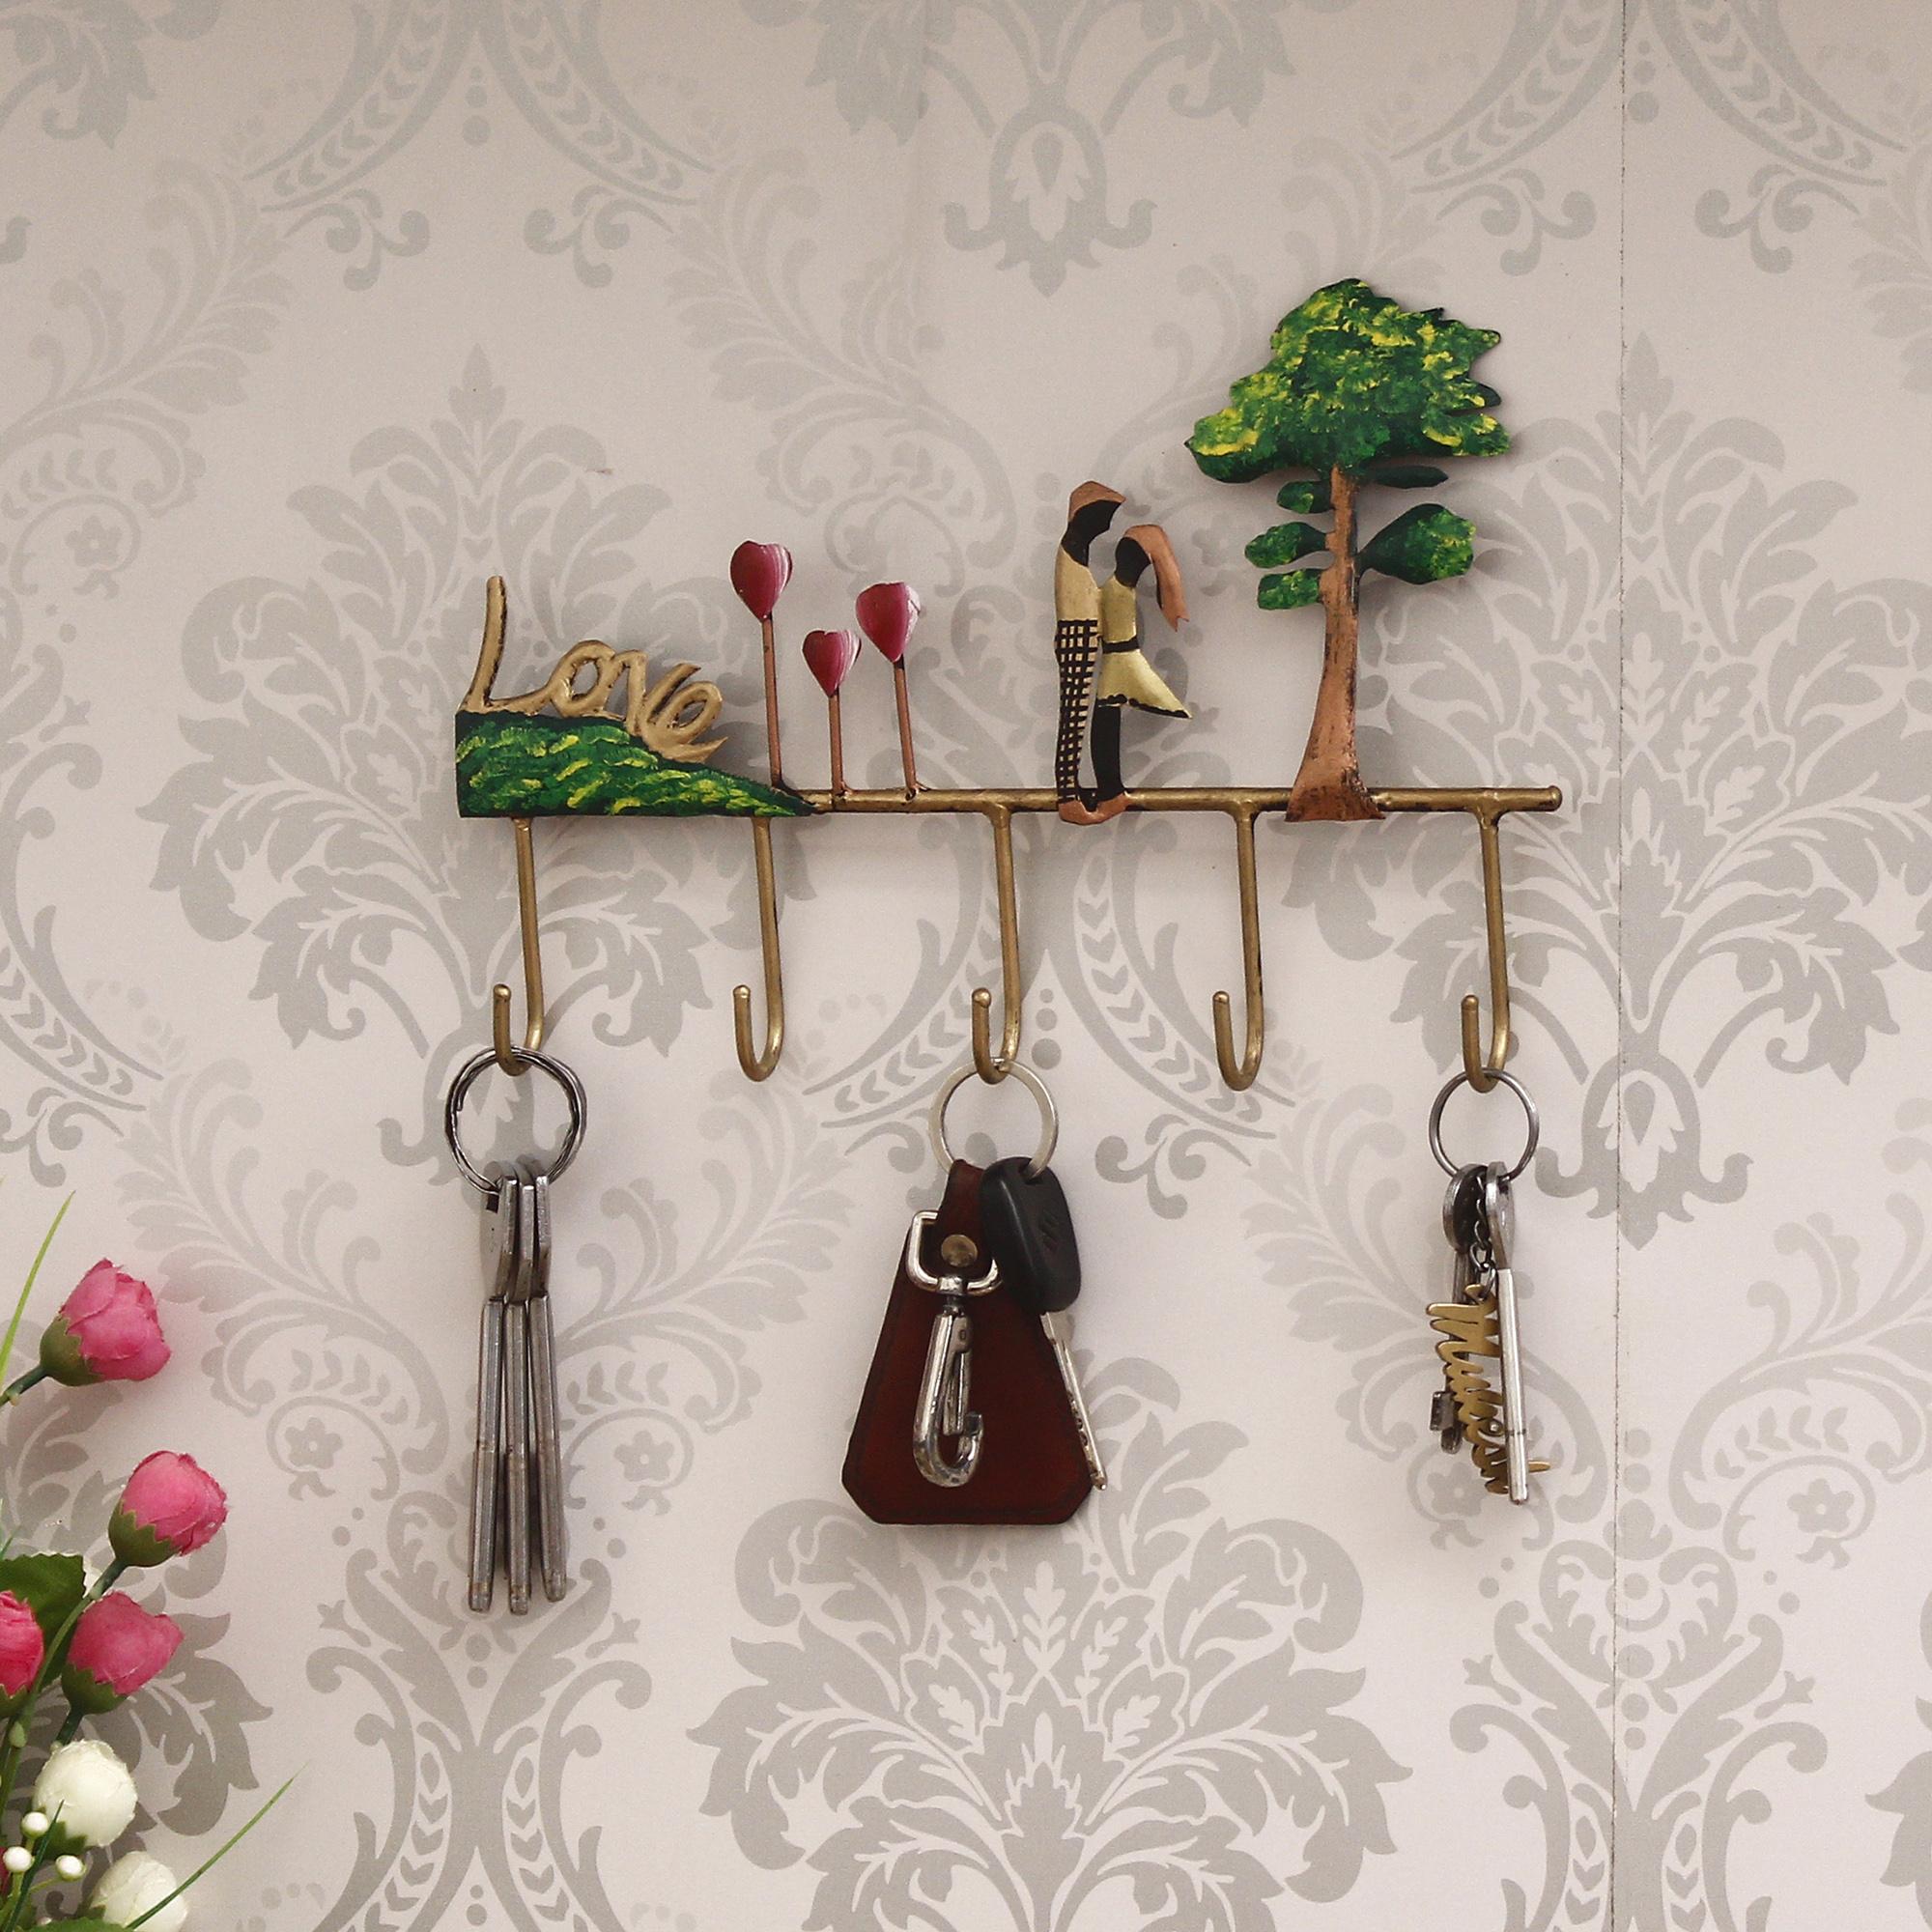 Love Theme Colorful Tribal Art 5 Hooks Iron Key Holder Indian Home Decor